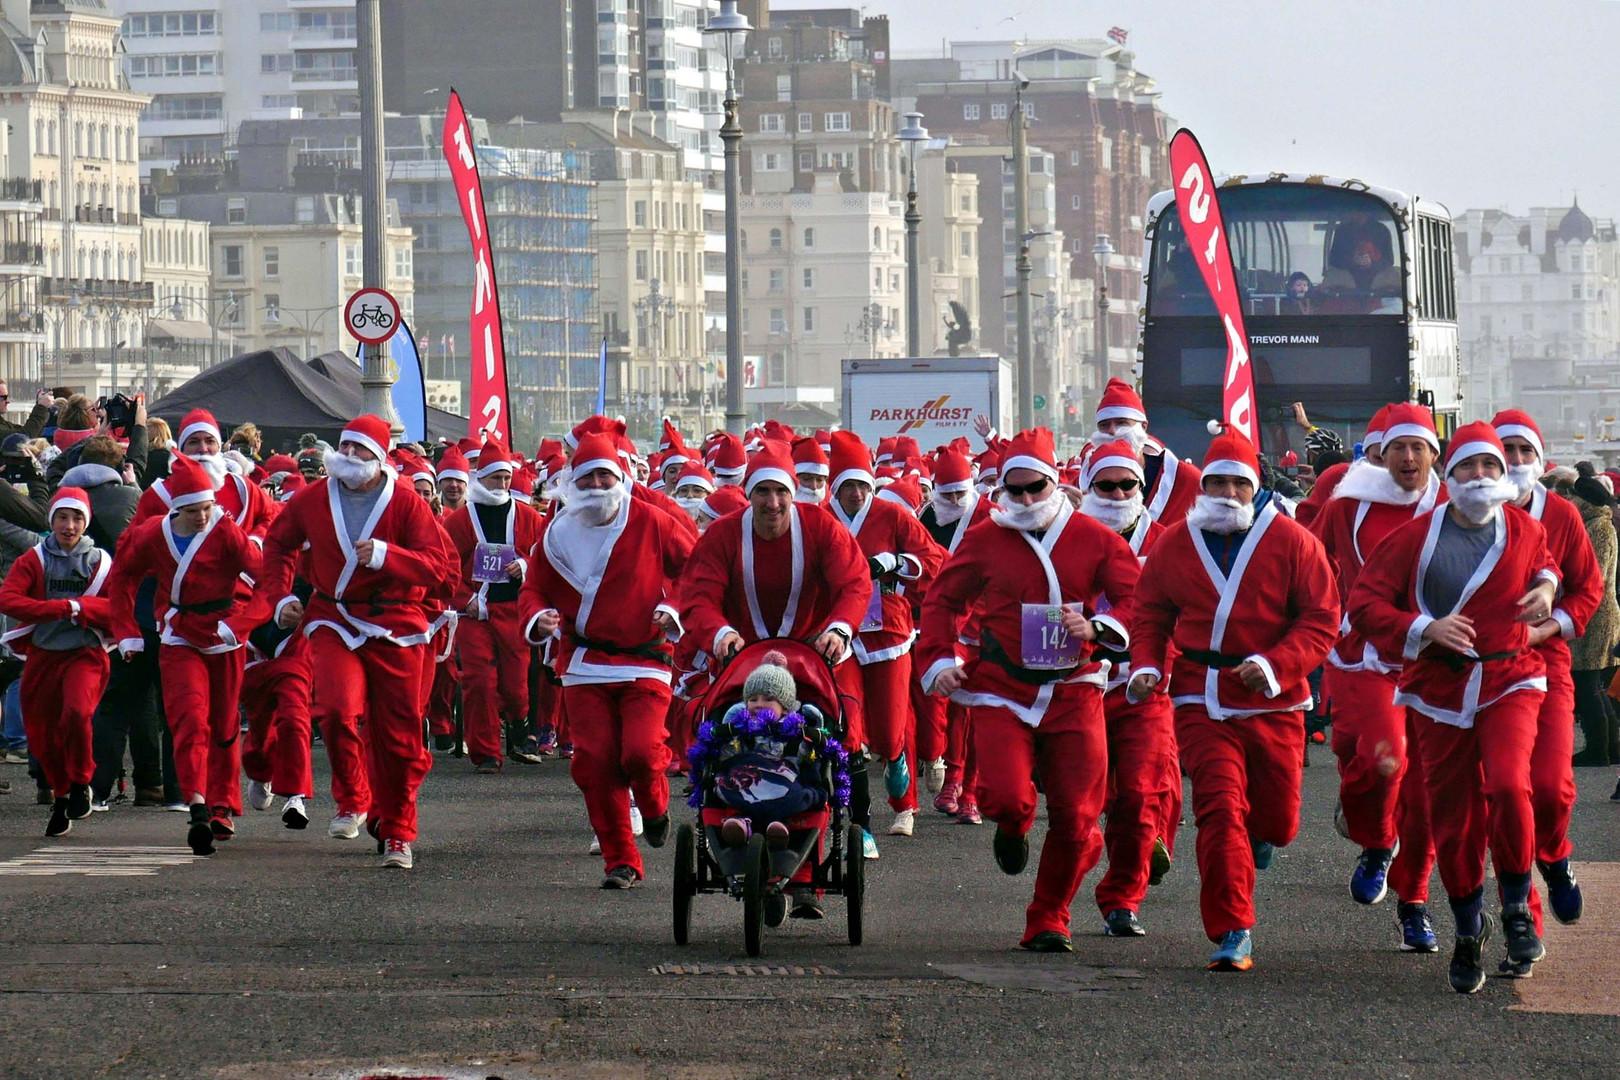 Running Santas on Brighton seafront